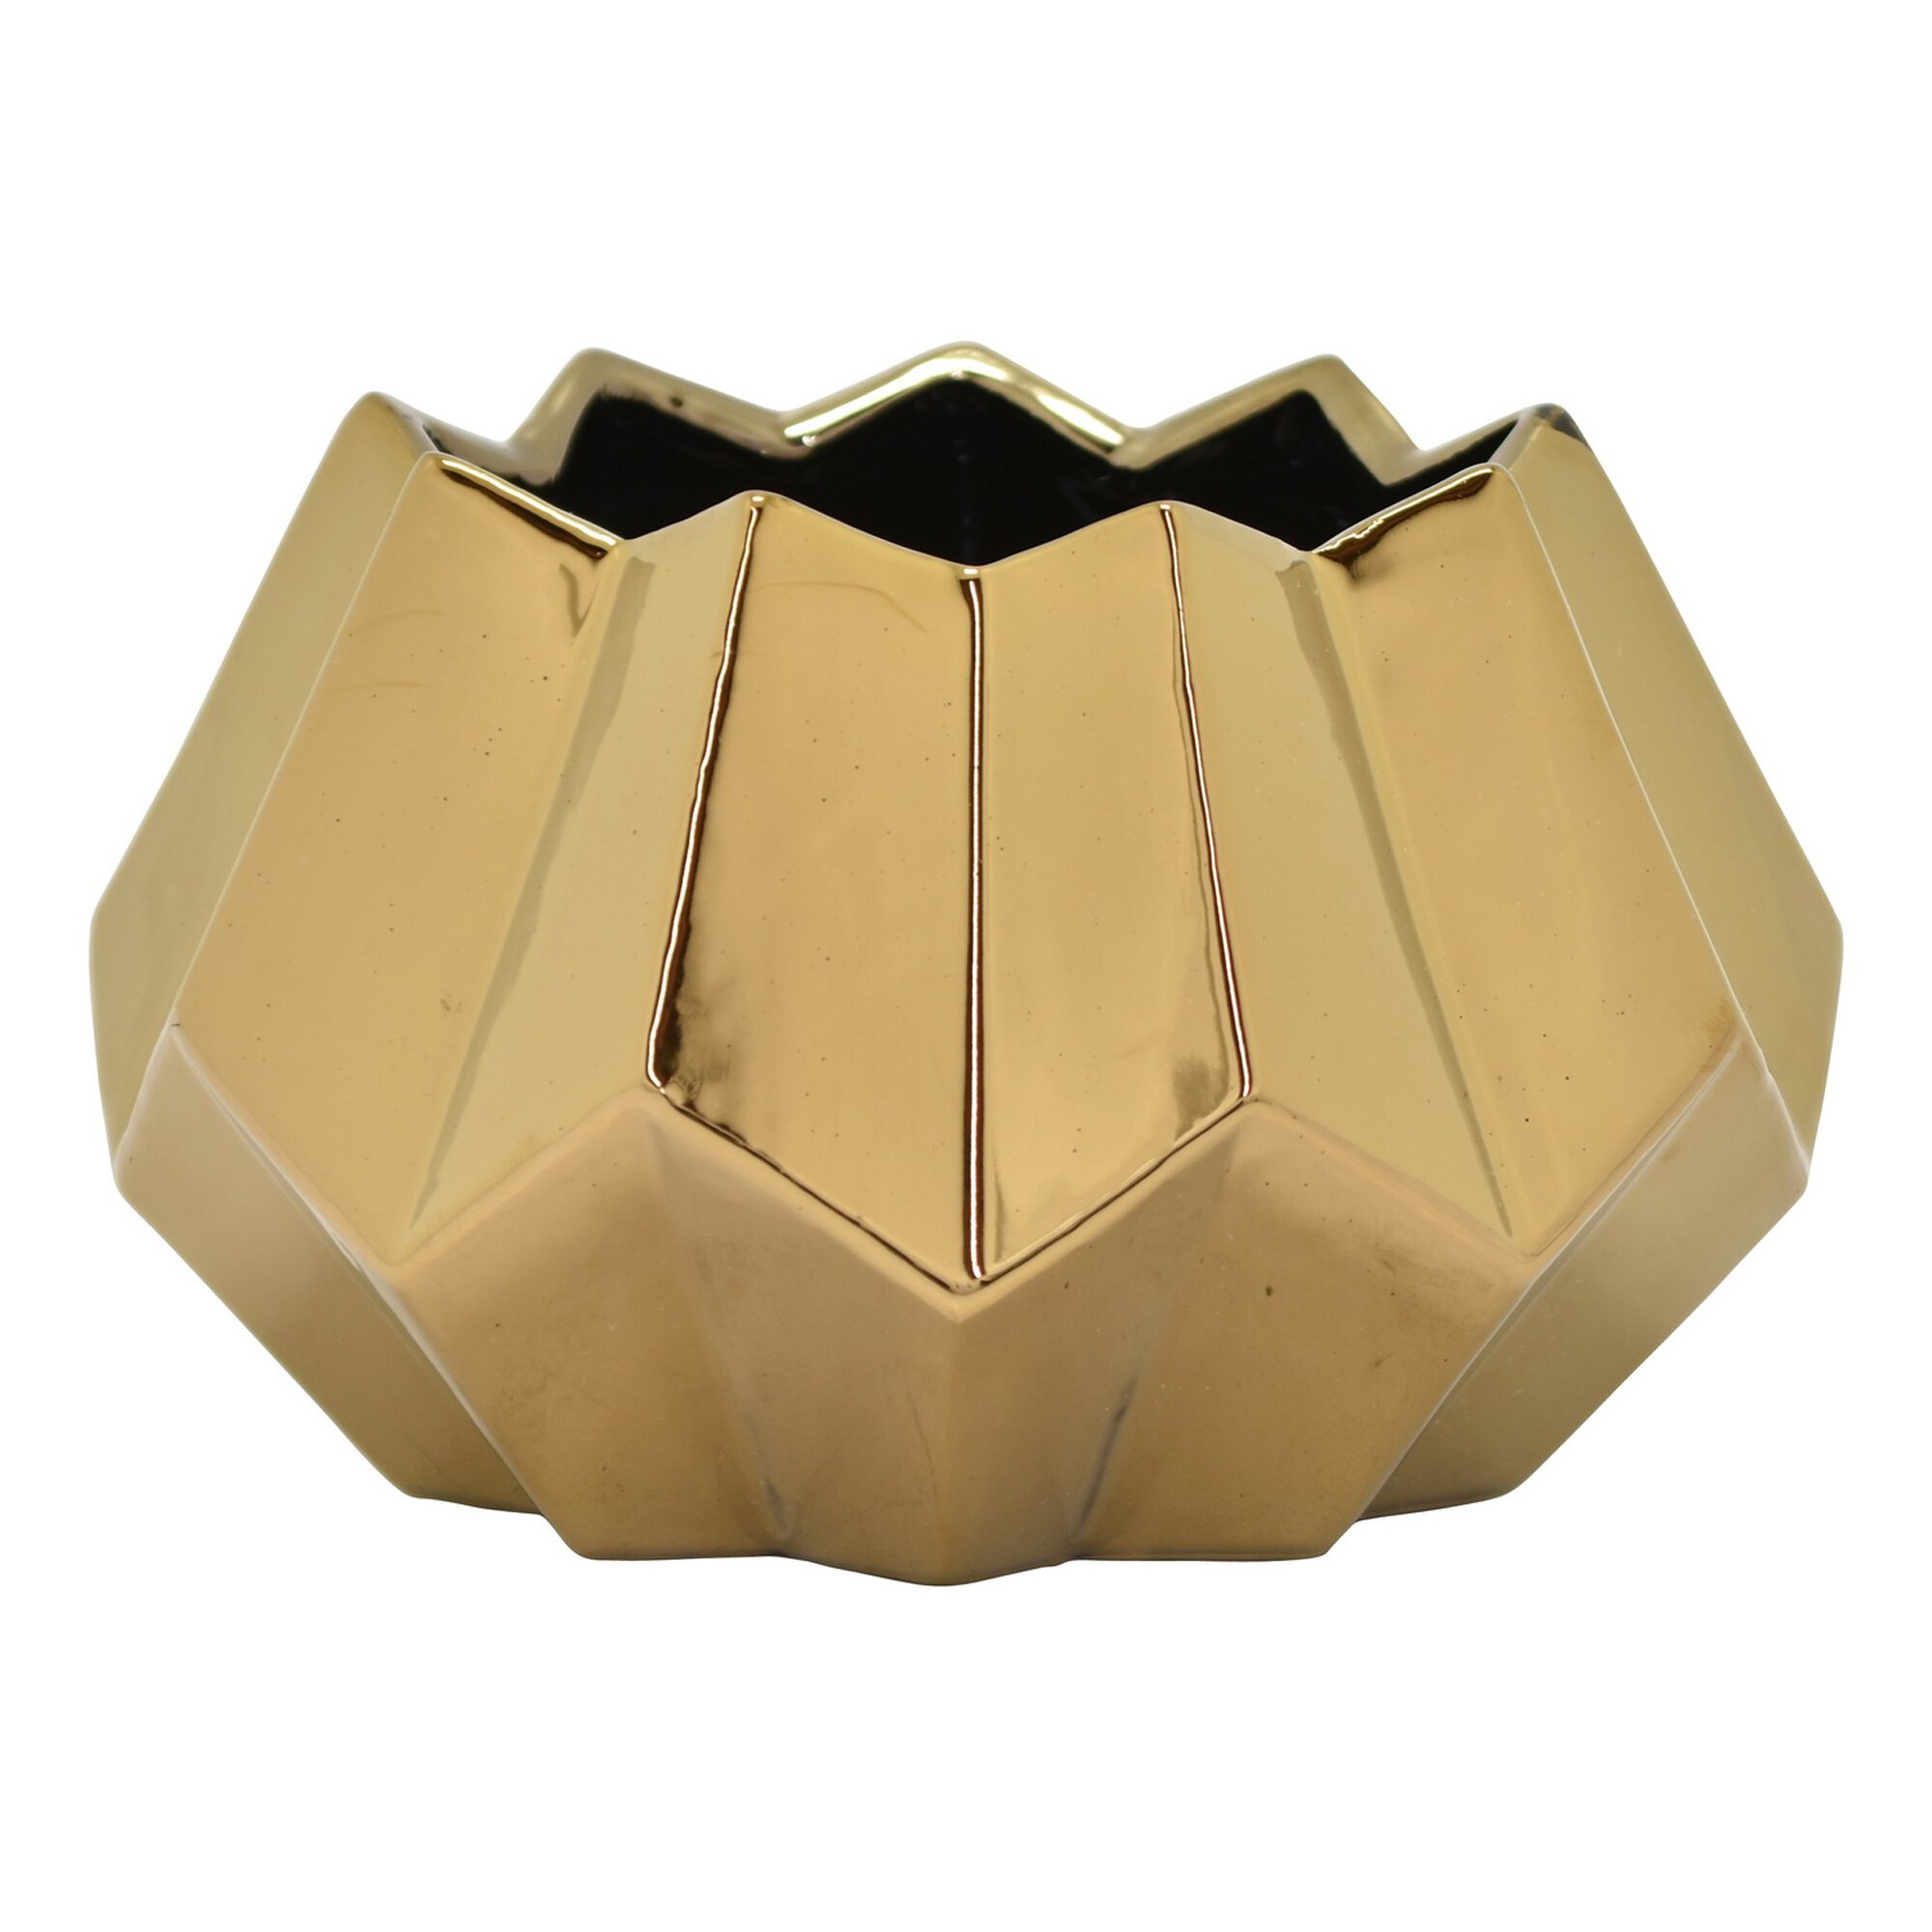 Mercer41 Tuohy Ceramic Pot Planter Wayfair